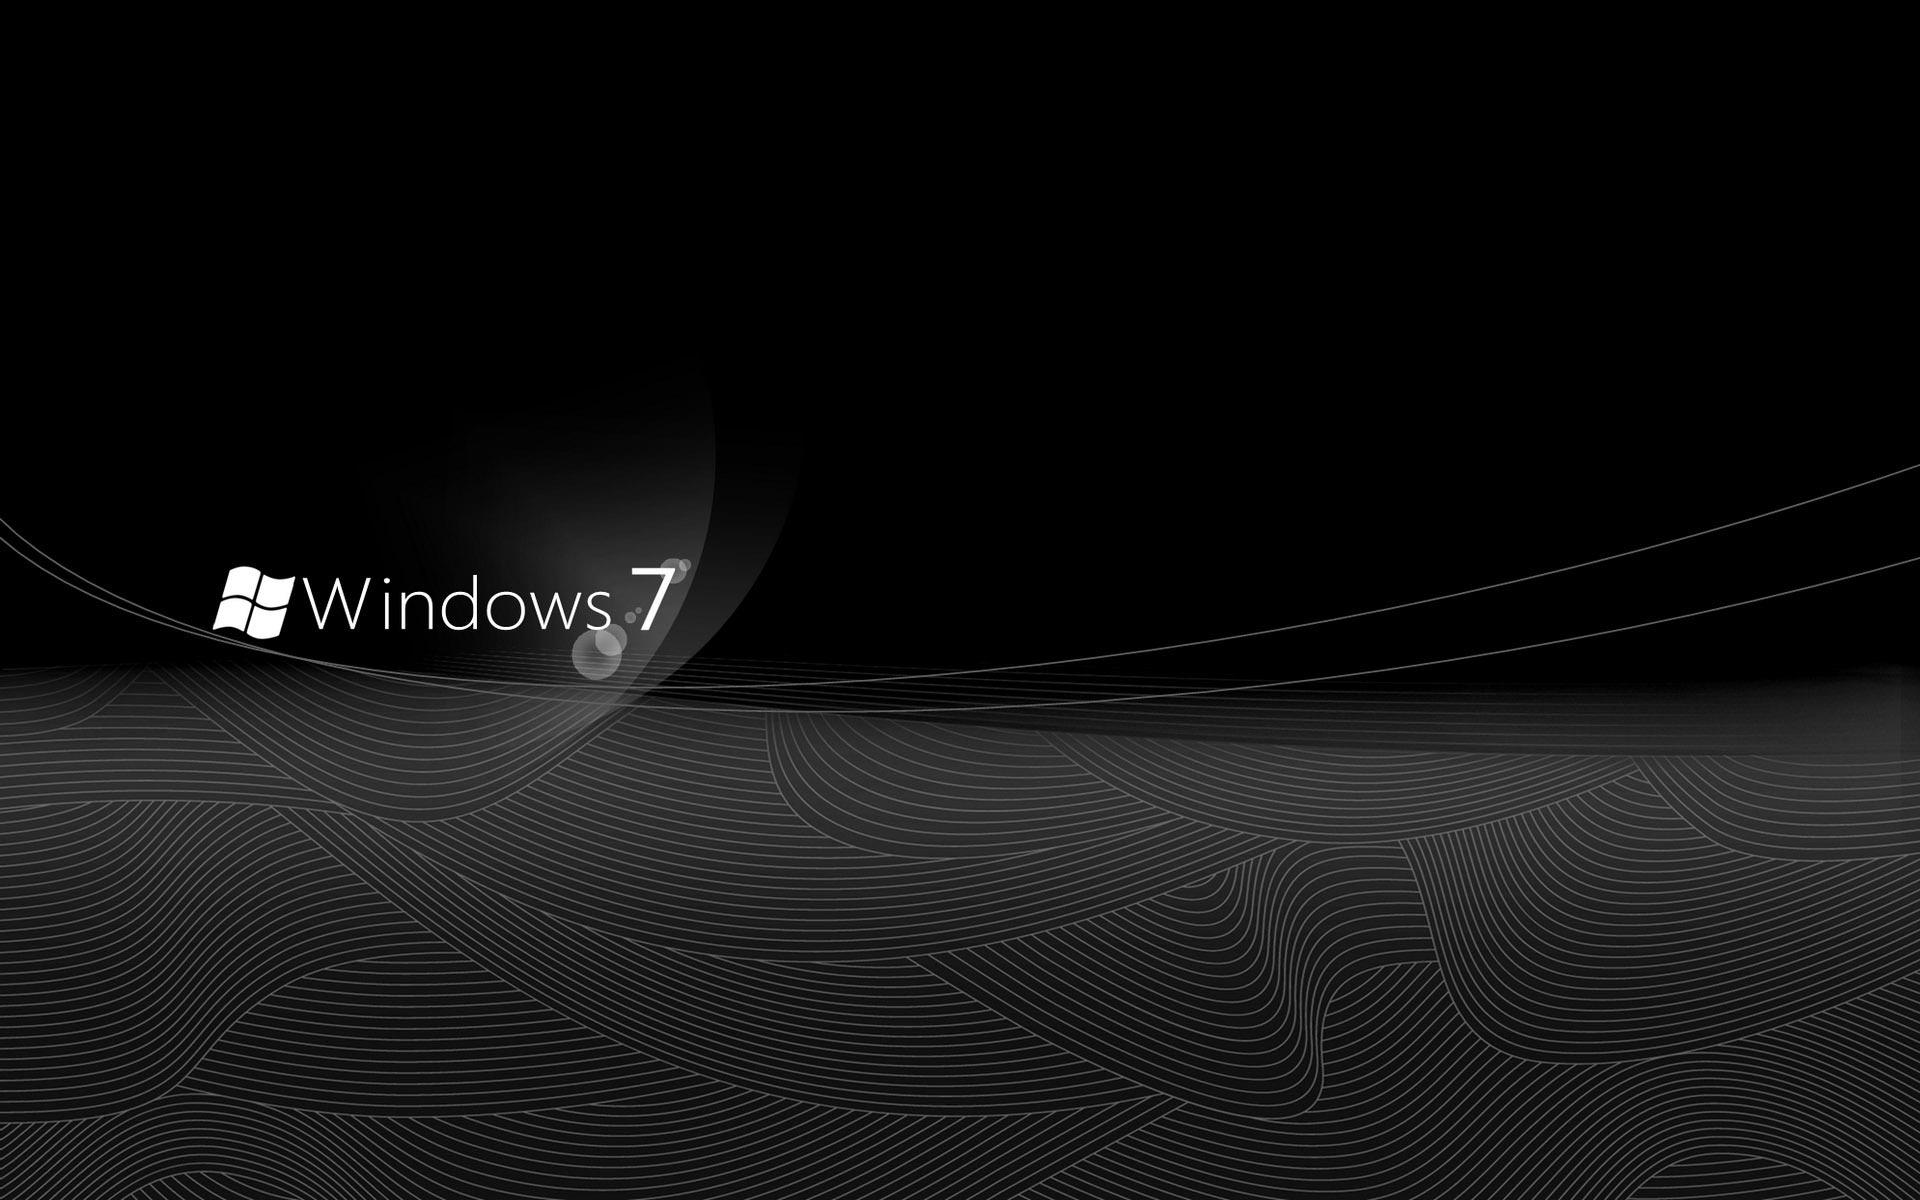 windows 7 elegant black desktop wallpaper and make this wallpaper for